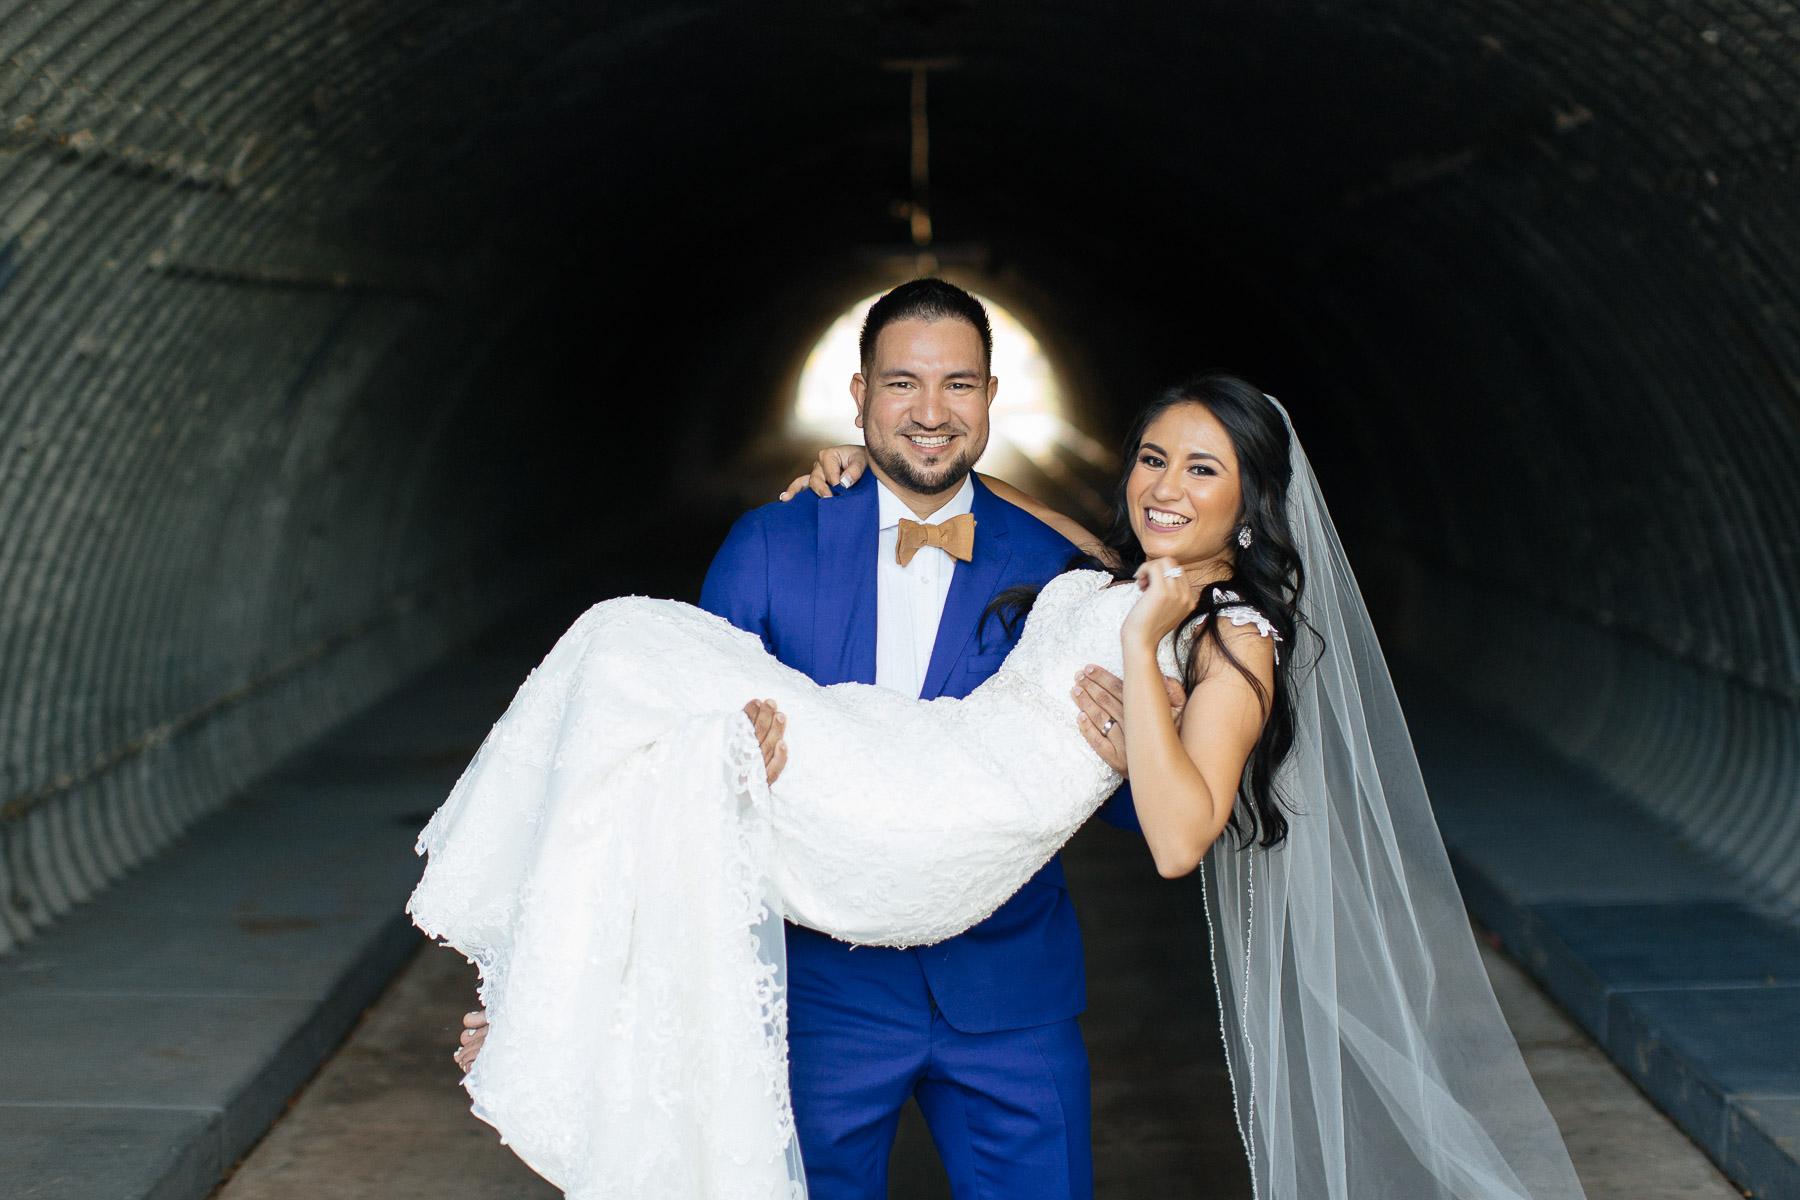 161029-Luxium-Weddings-Arizona-Jeff-Griselda-First-Look-Val-Vista-Lakes-Gilber-062.jpg